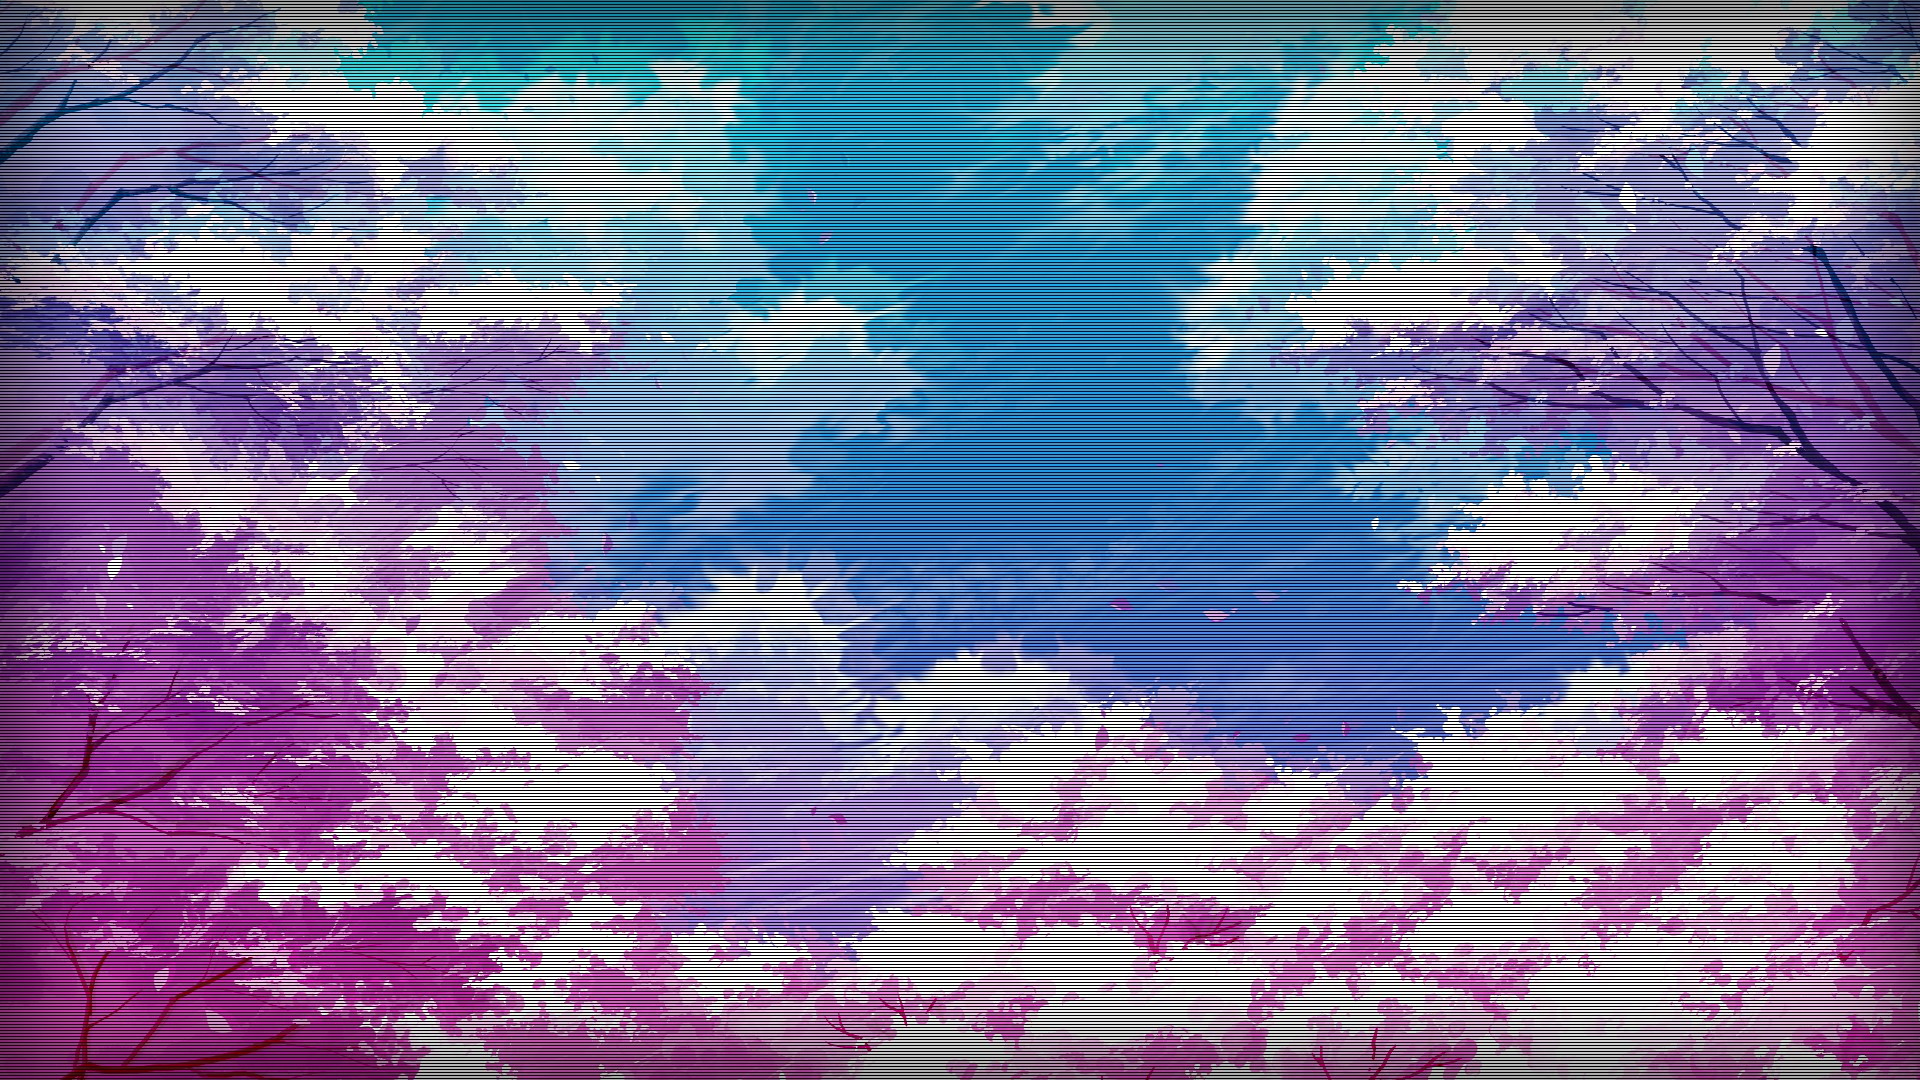 Vaporwave wallpaper 1920x1080 ·① Download free awesome full HD wallpapers for desktop, mobile ...